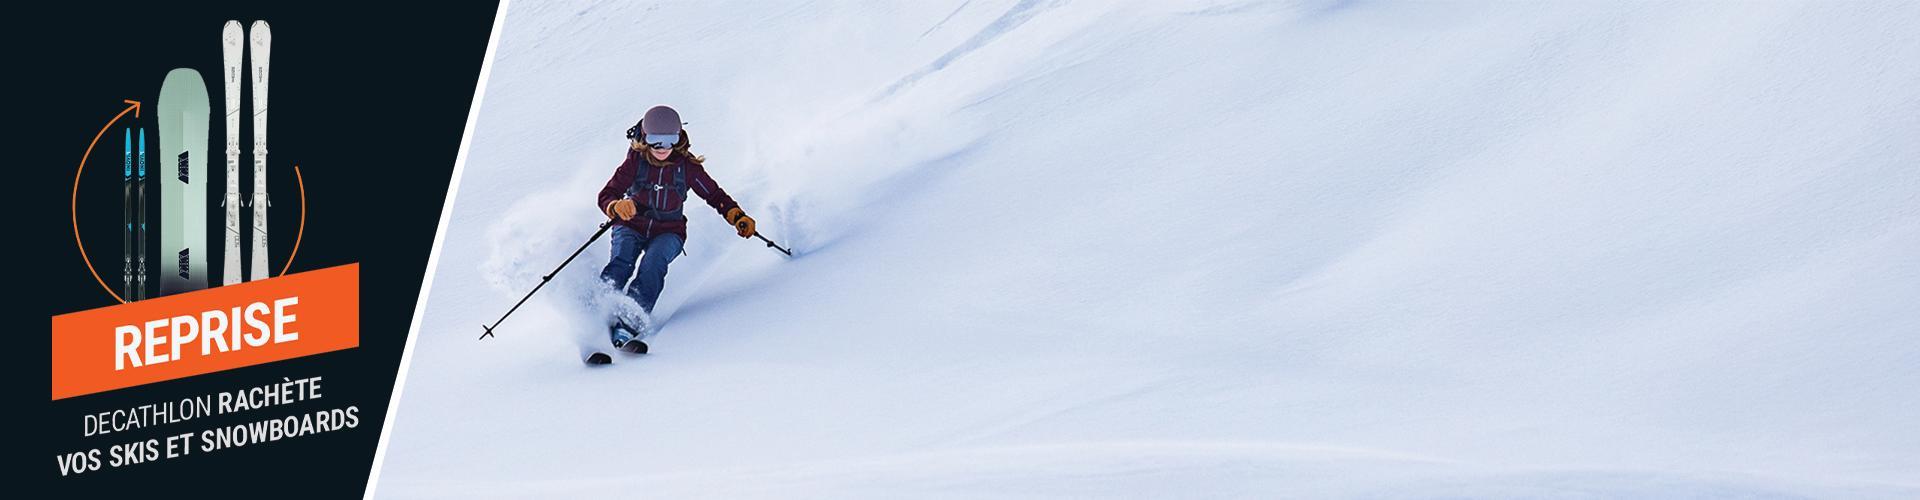 reprise ski decathlon DESKTOP